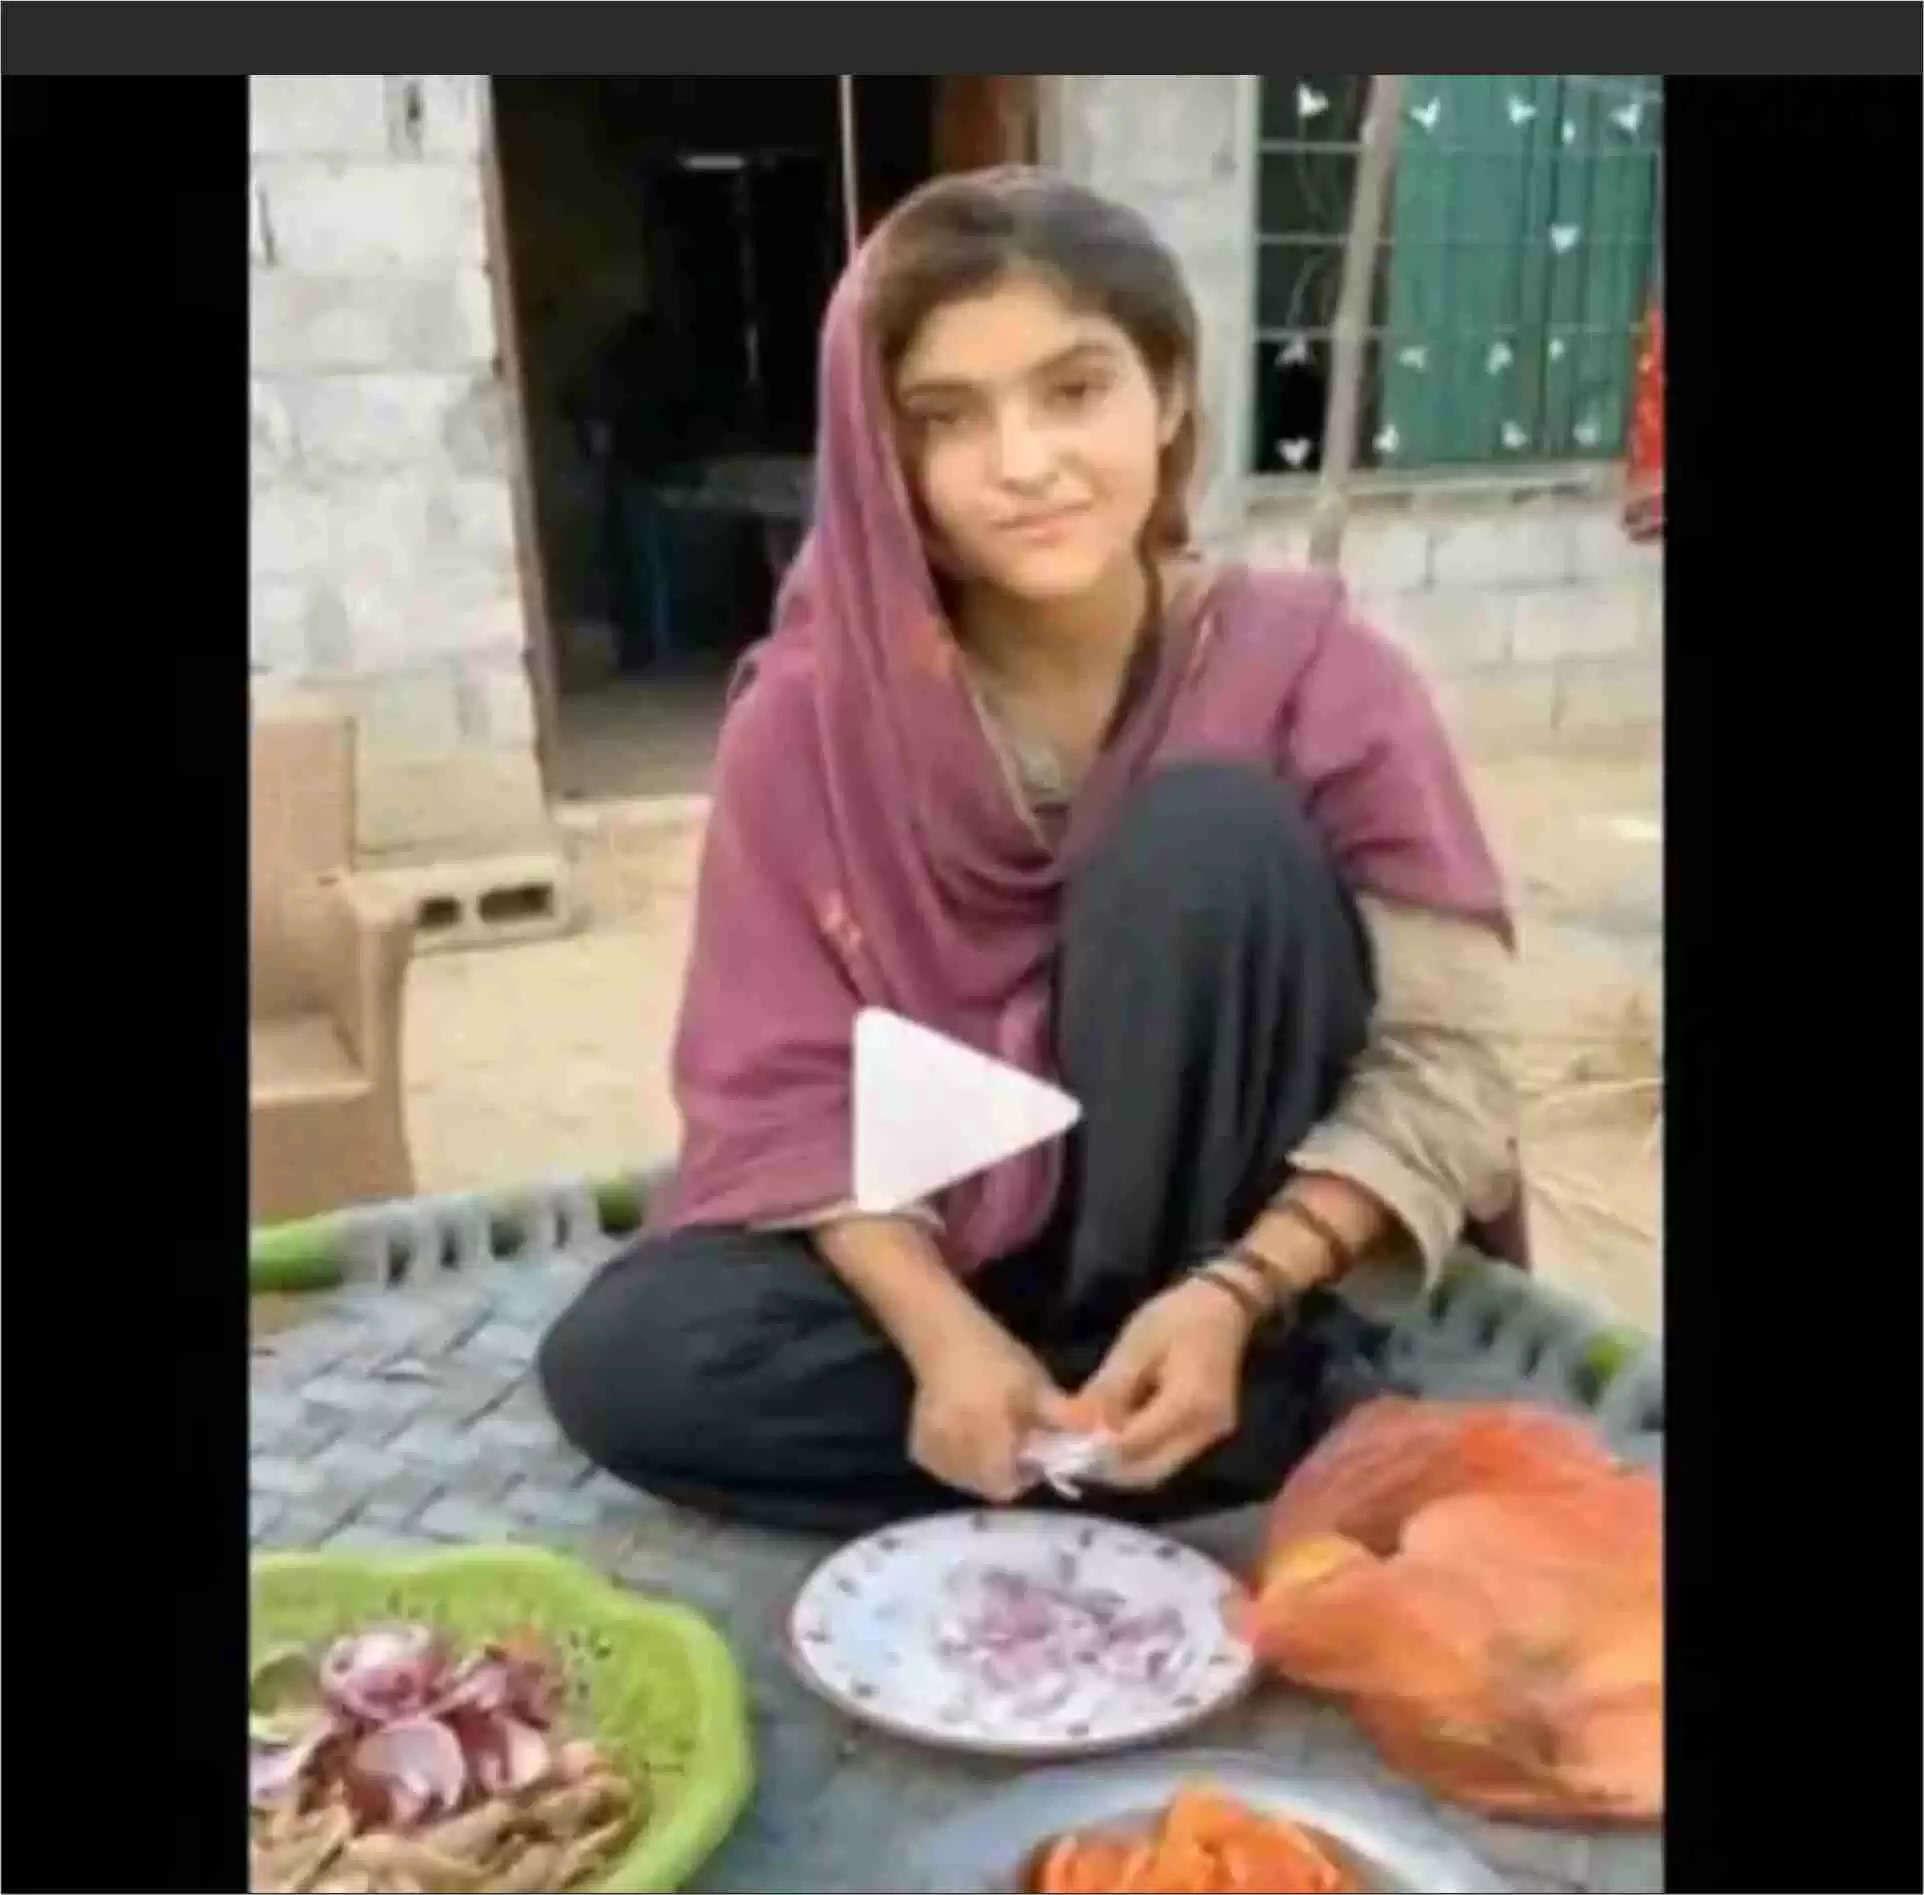 Pakistani Girl की खूबसूरत मुस्कान हुई Viral, रातोंरात बनी Internet Sensation